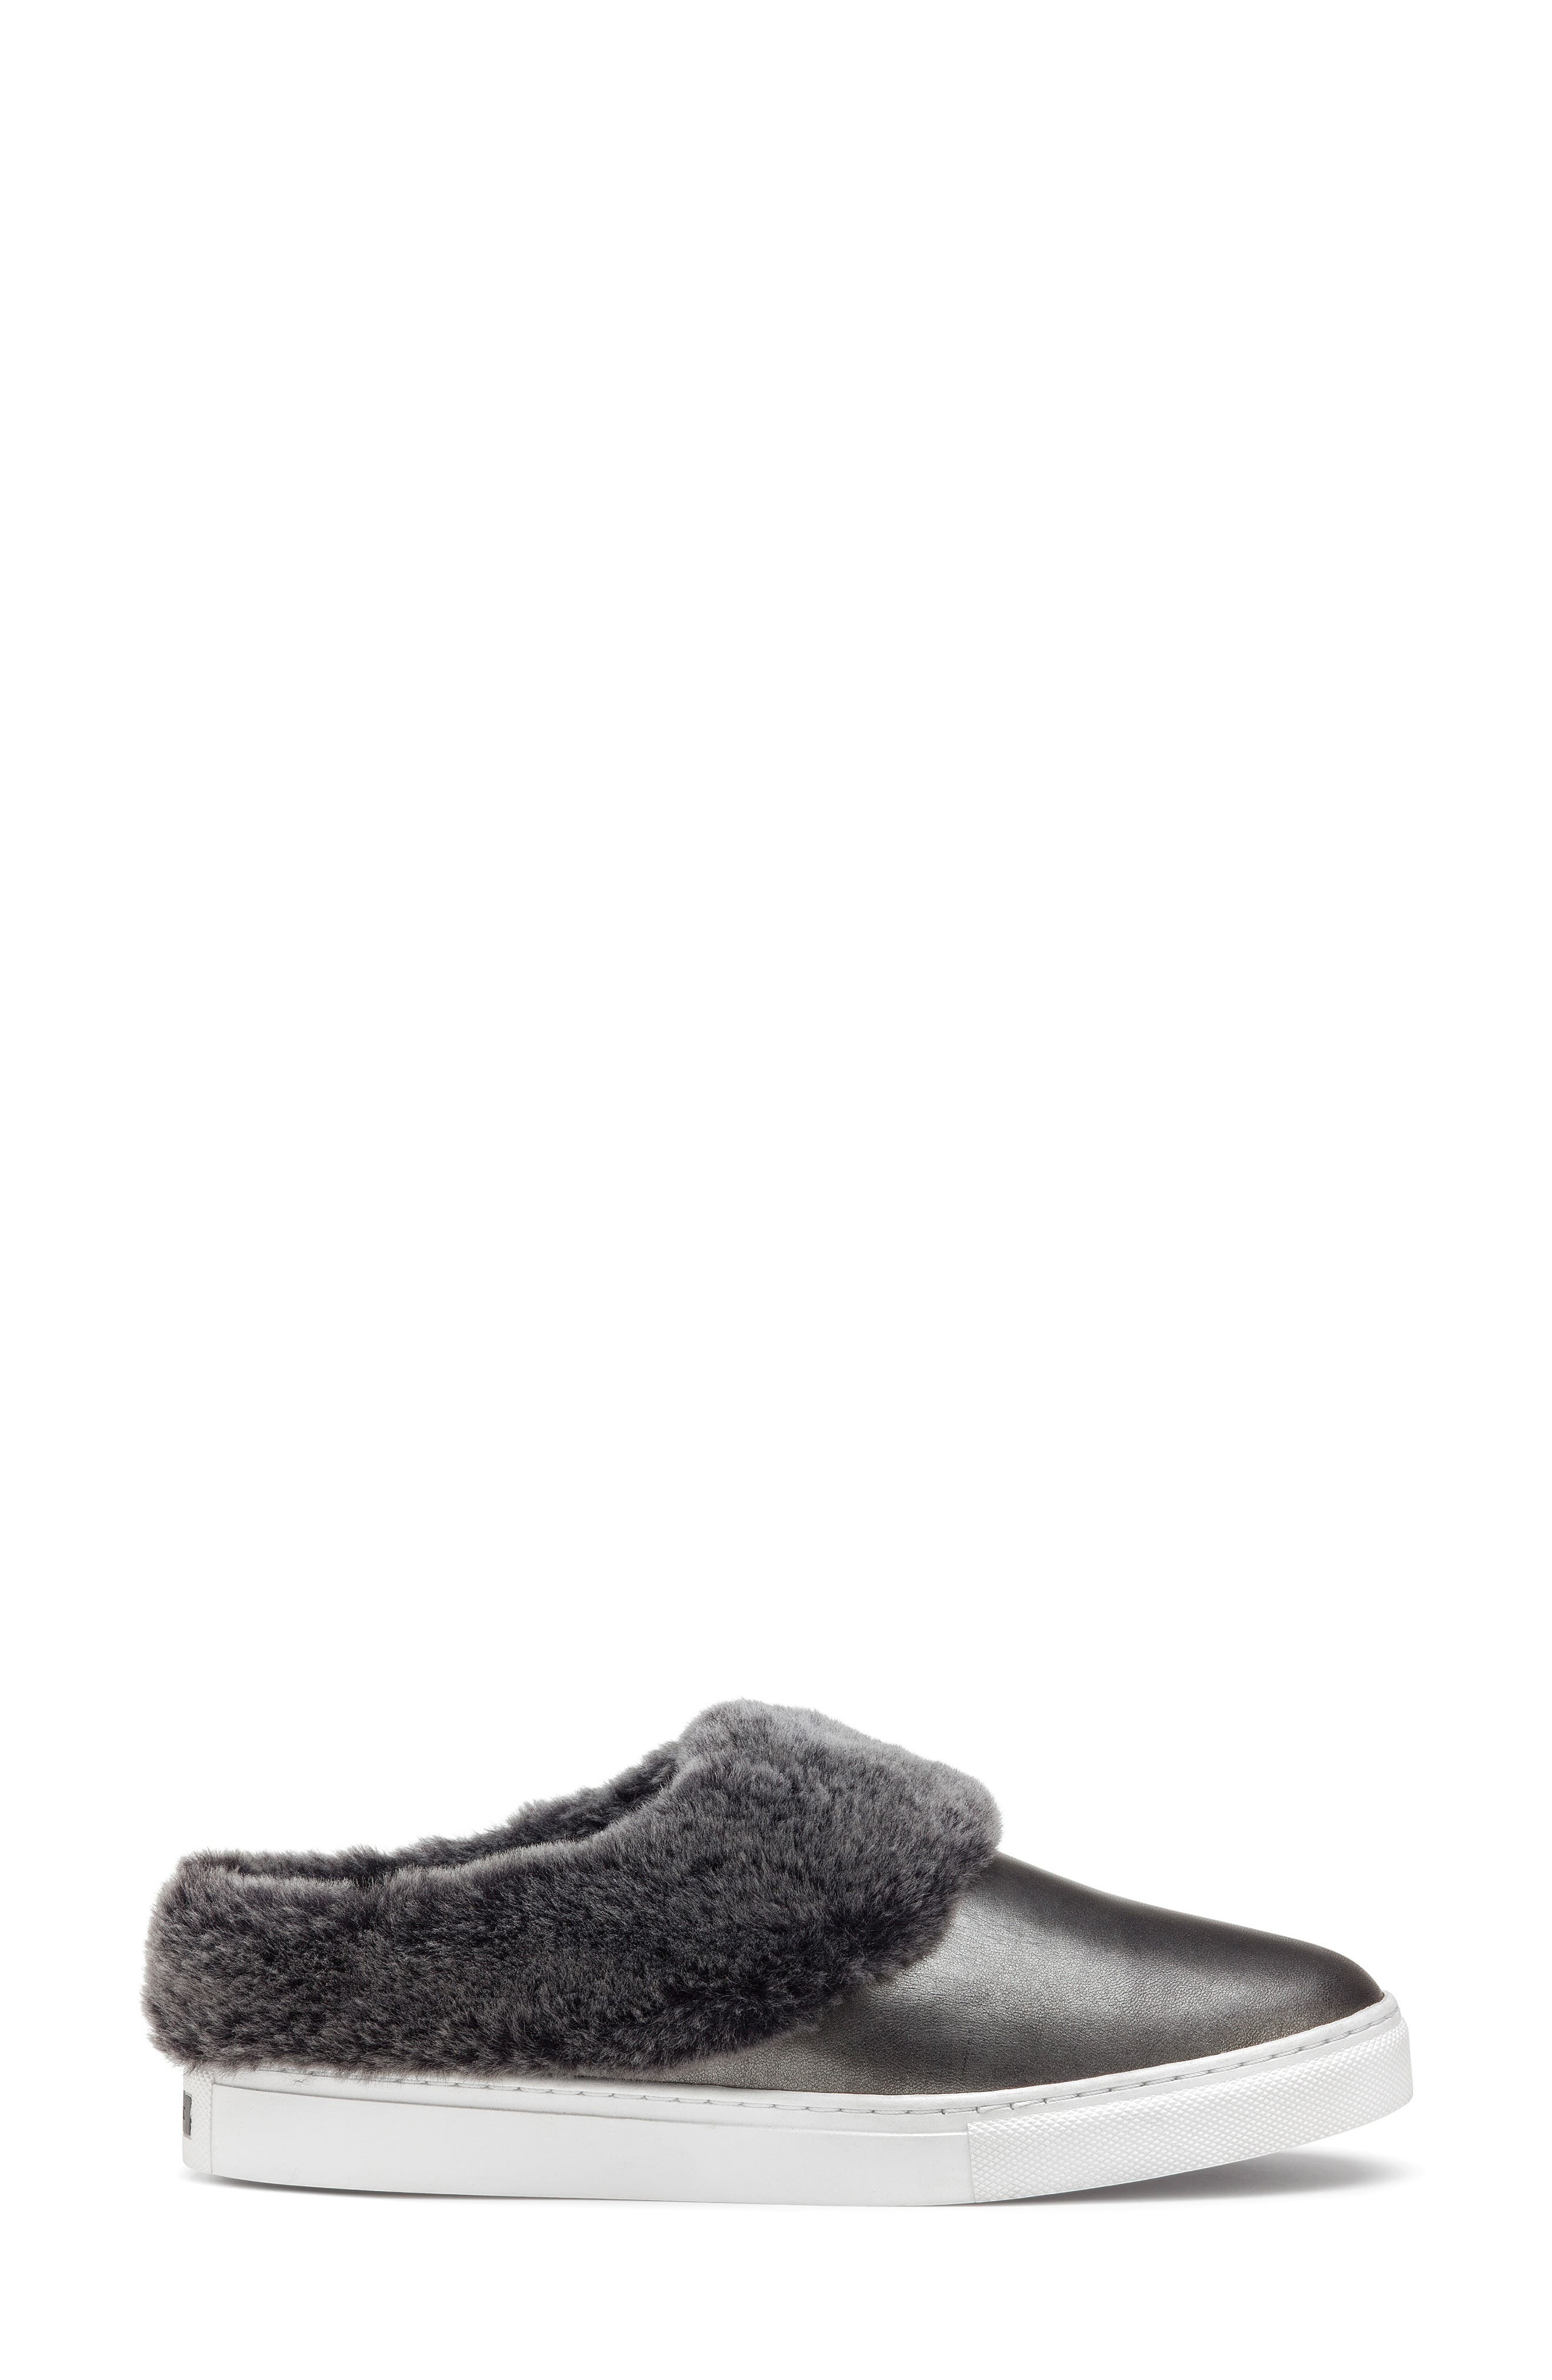 TRASK, Lisa Genuine Shearling Trim Slip-On Sneaker, Alternate thumbnail 3, color, PEWTER LEATHER